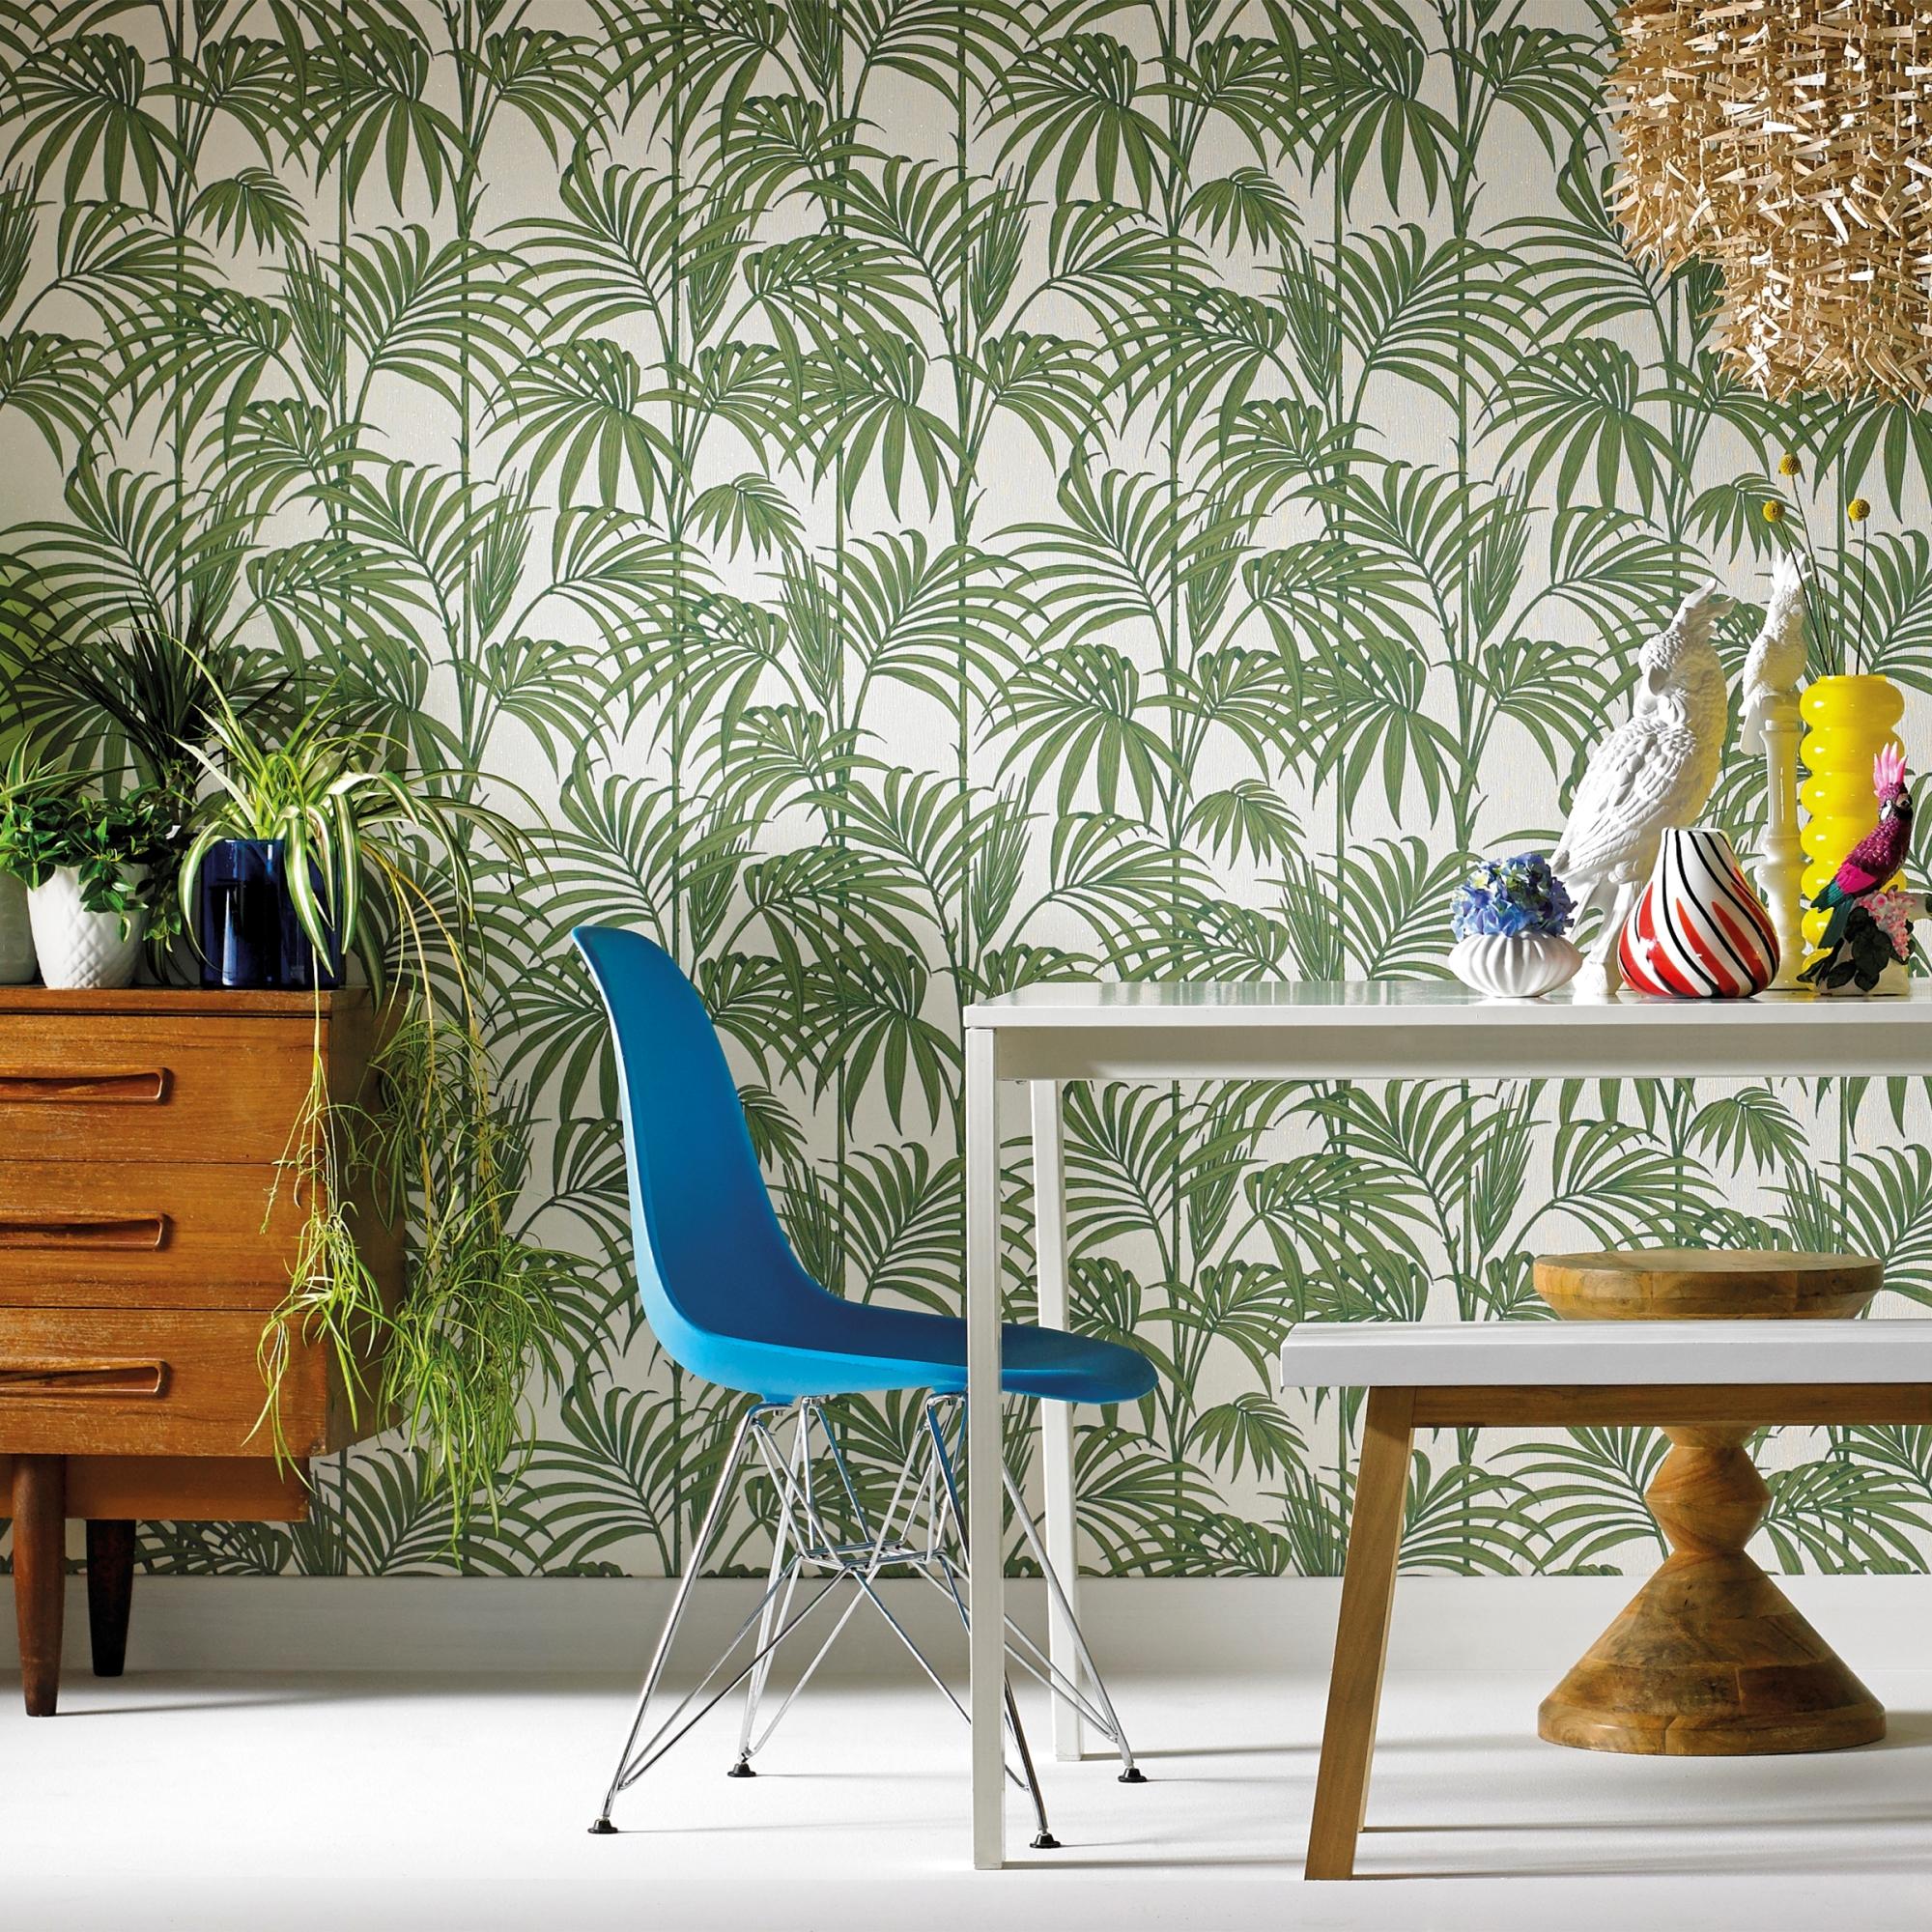 Papier peint intissé Honolulu vinyle vert blanc 1005x52cm